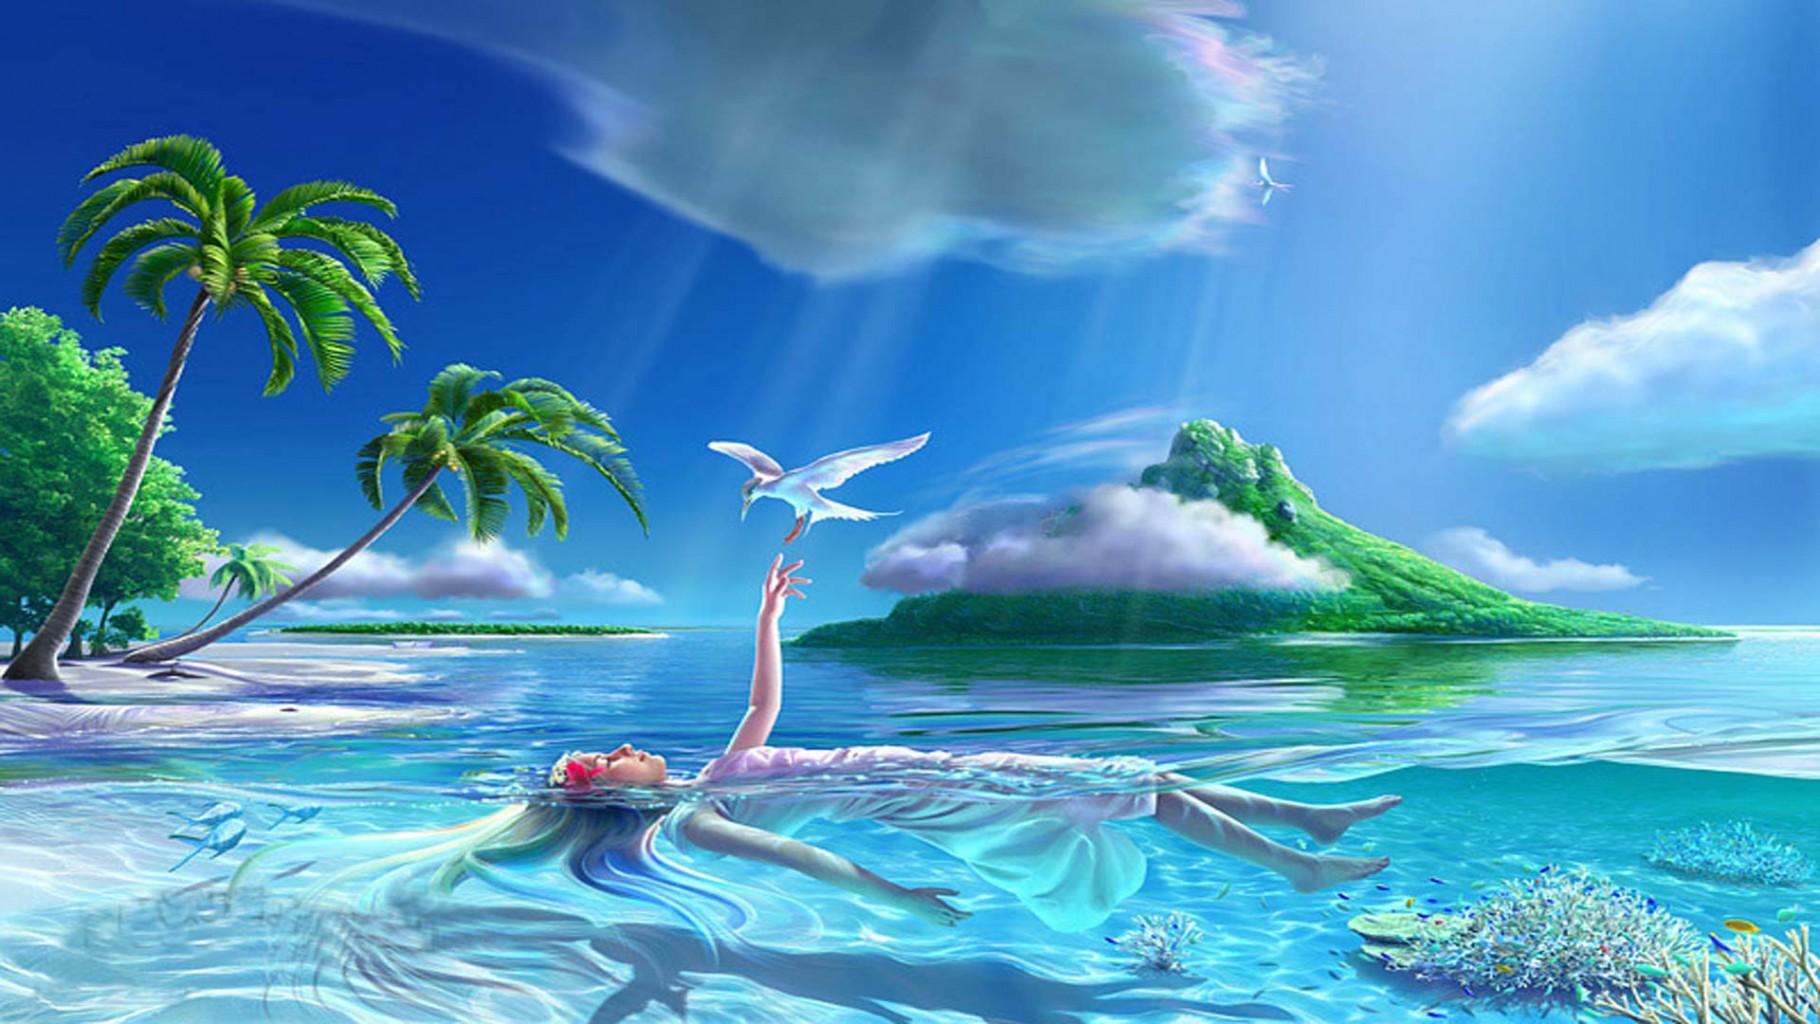 Fondo paisajes islas en fondos de pantalla for Fondo de pantalla chulo